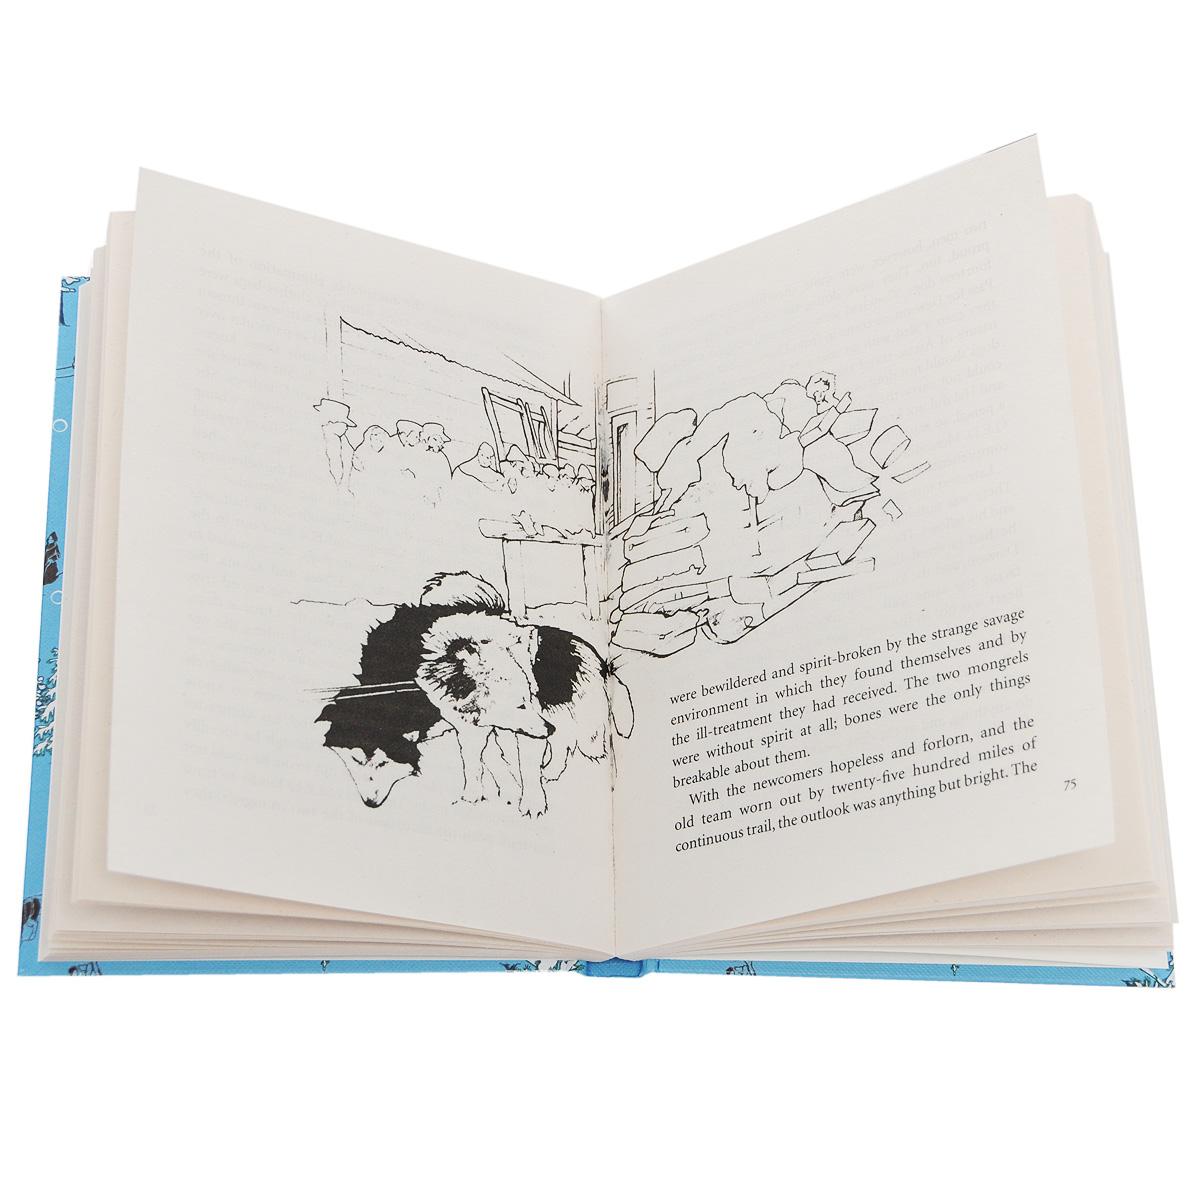 Puffin Classics Deluxe Collection (комплект из 8 книг)